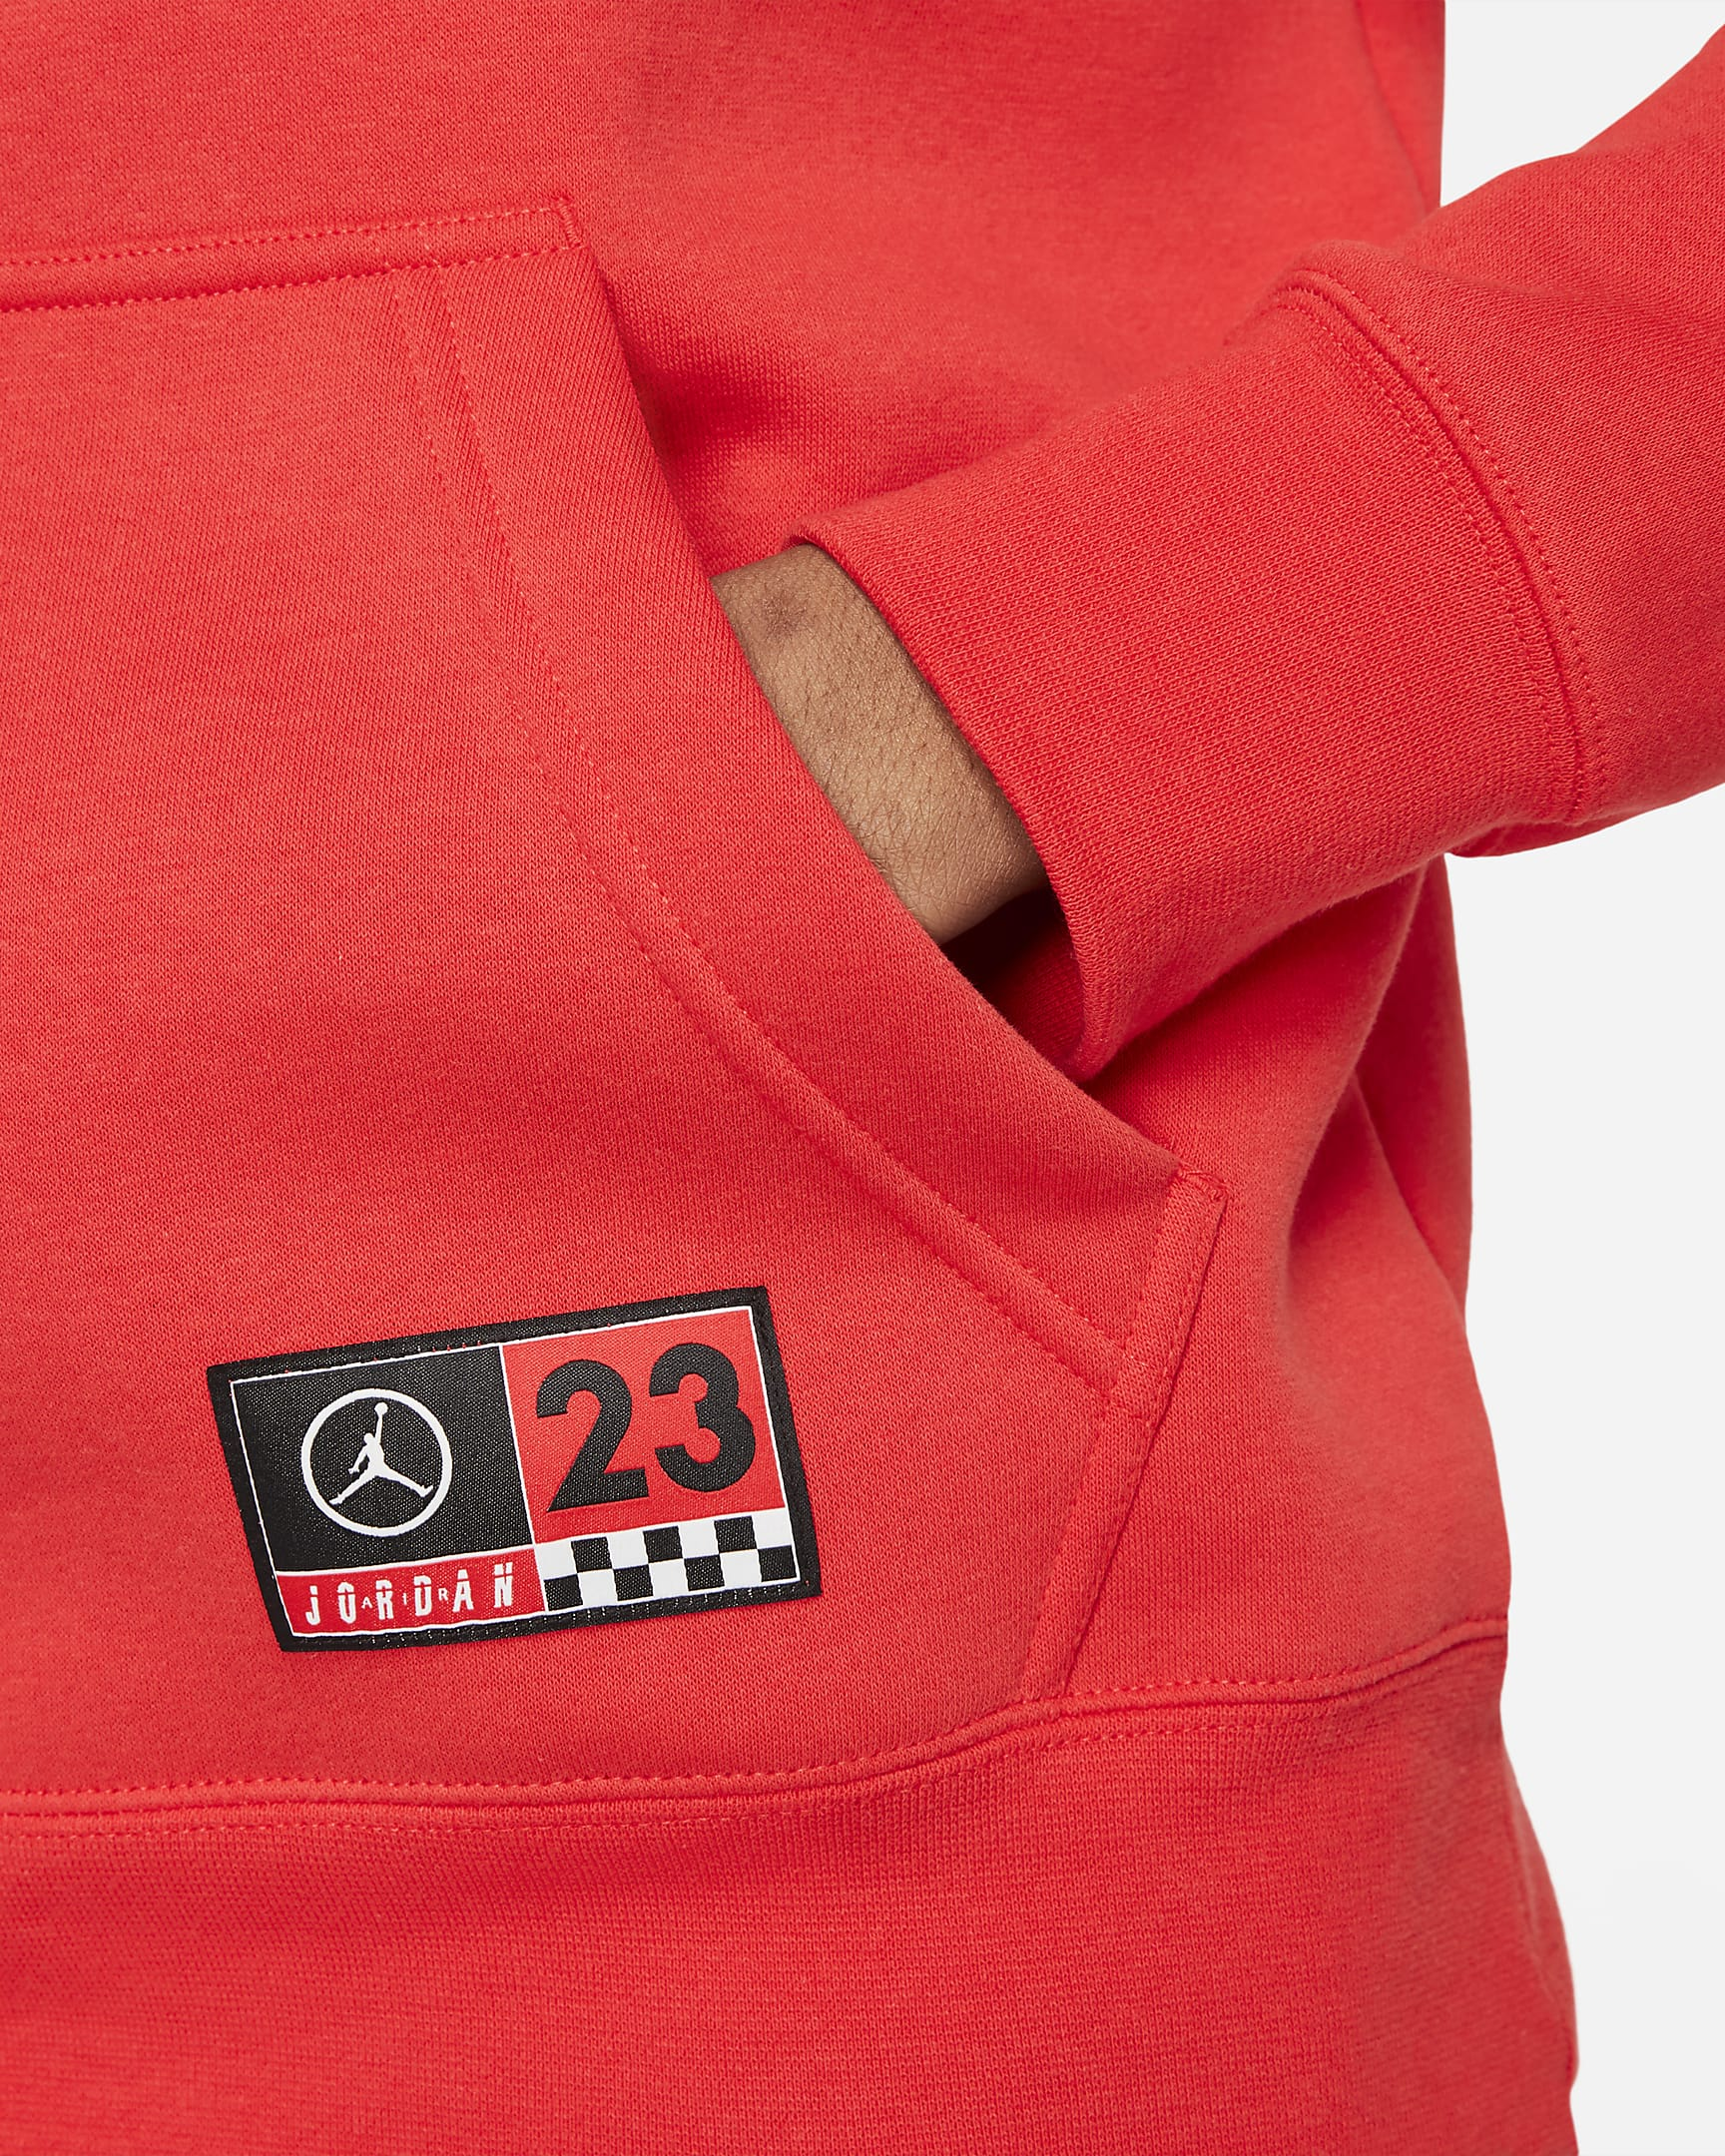 jordan-sport-dna-mens-hbr-pullover-hoodie-1SFRQ0-8